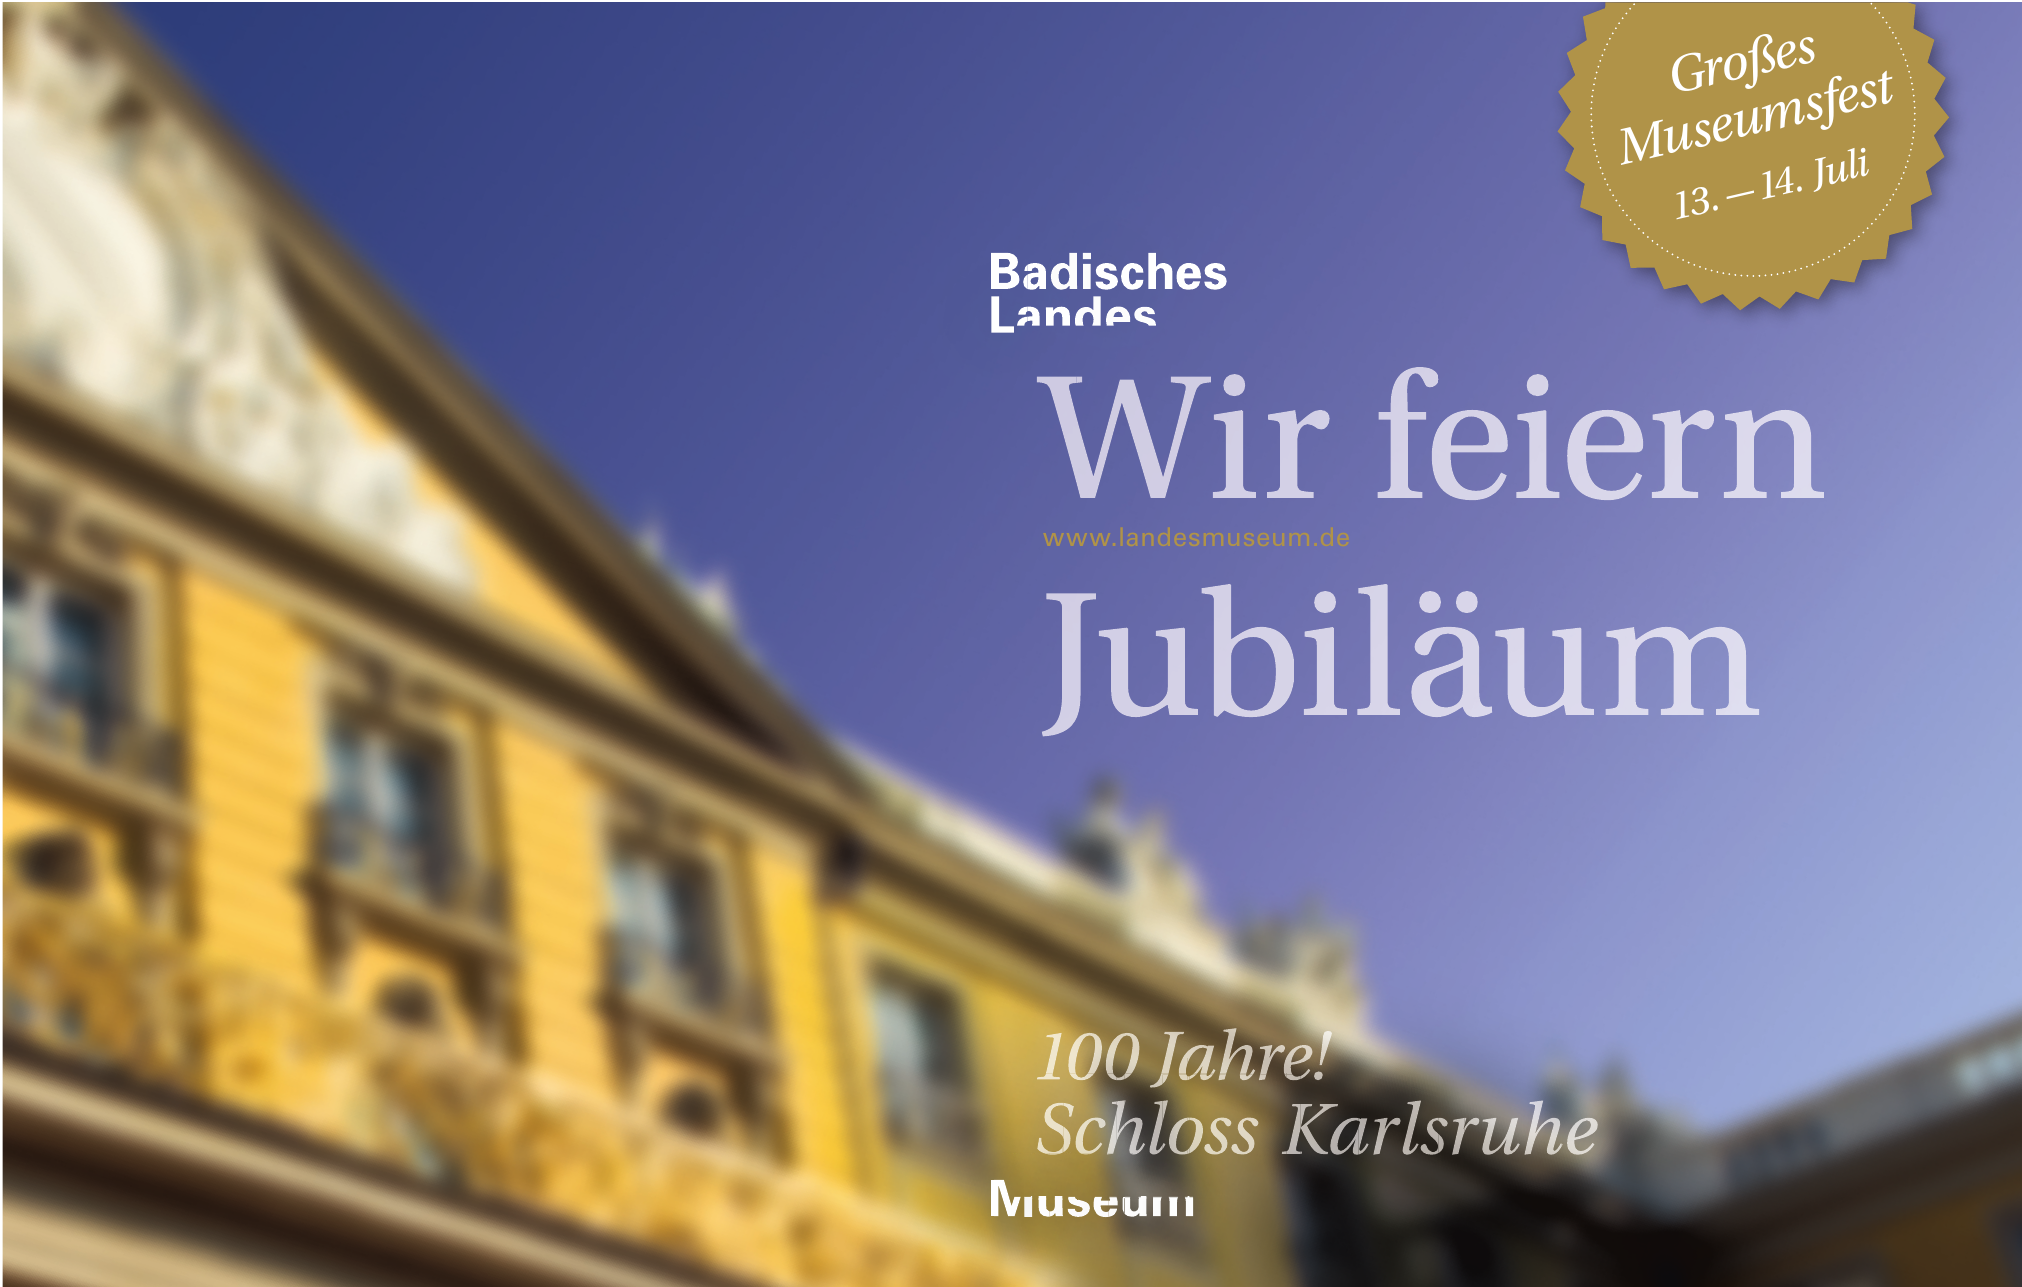 Badisches Landes Museum - Großes Museumsfest